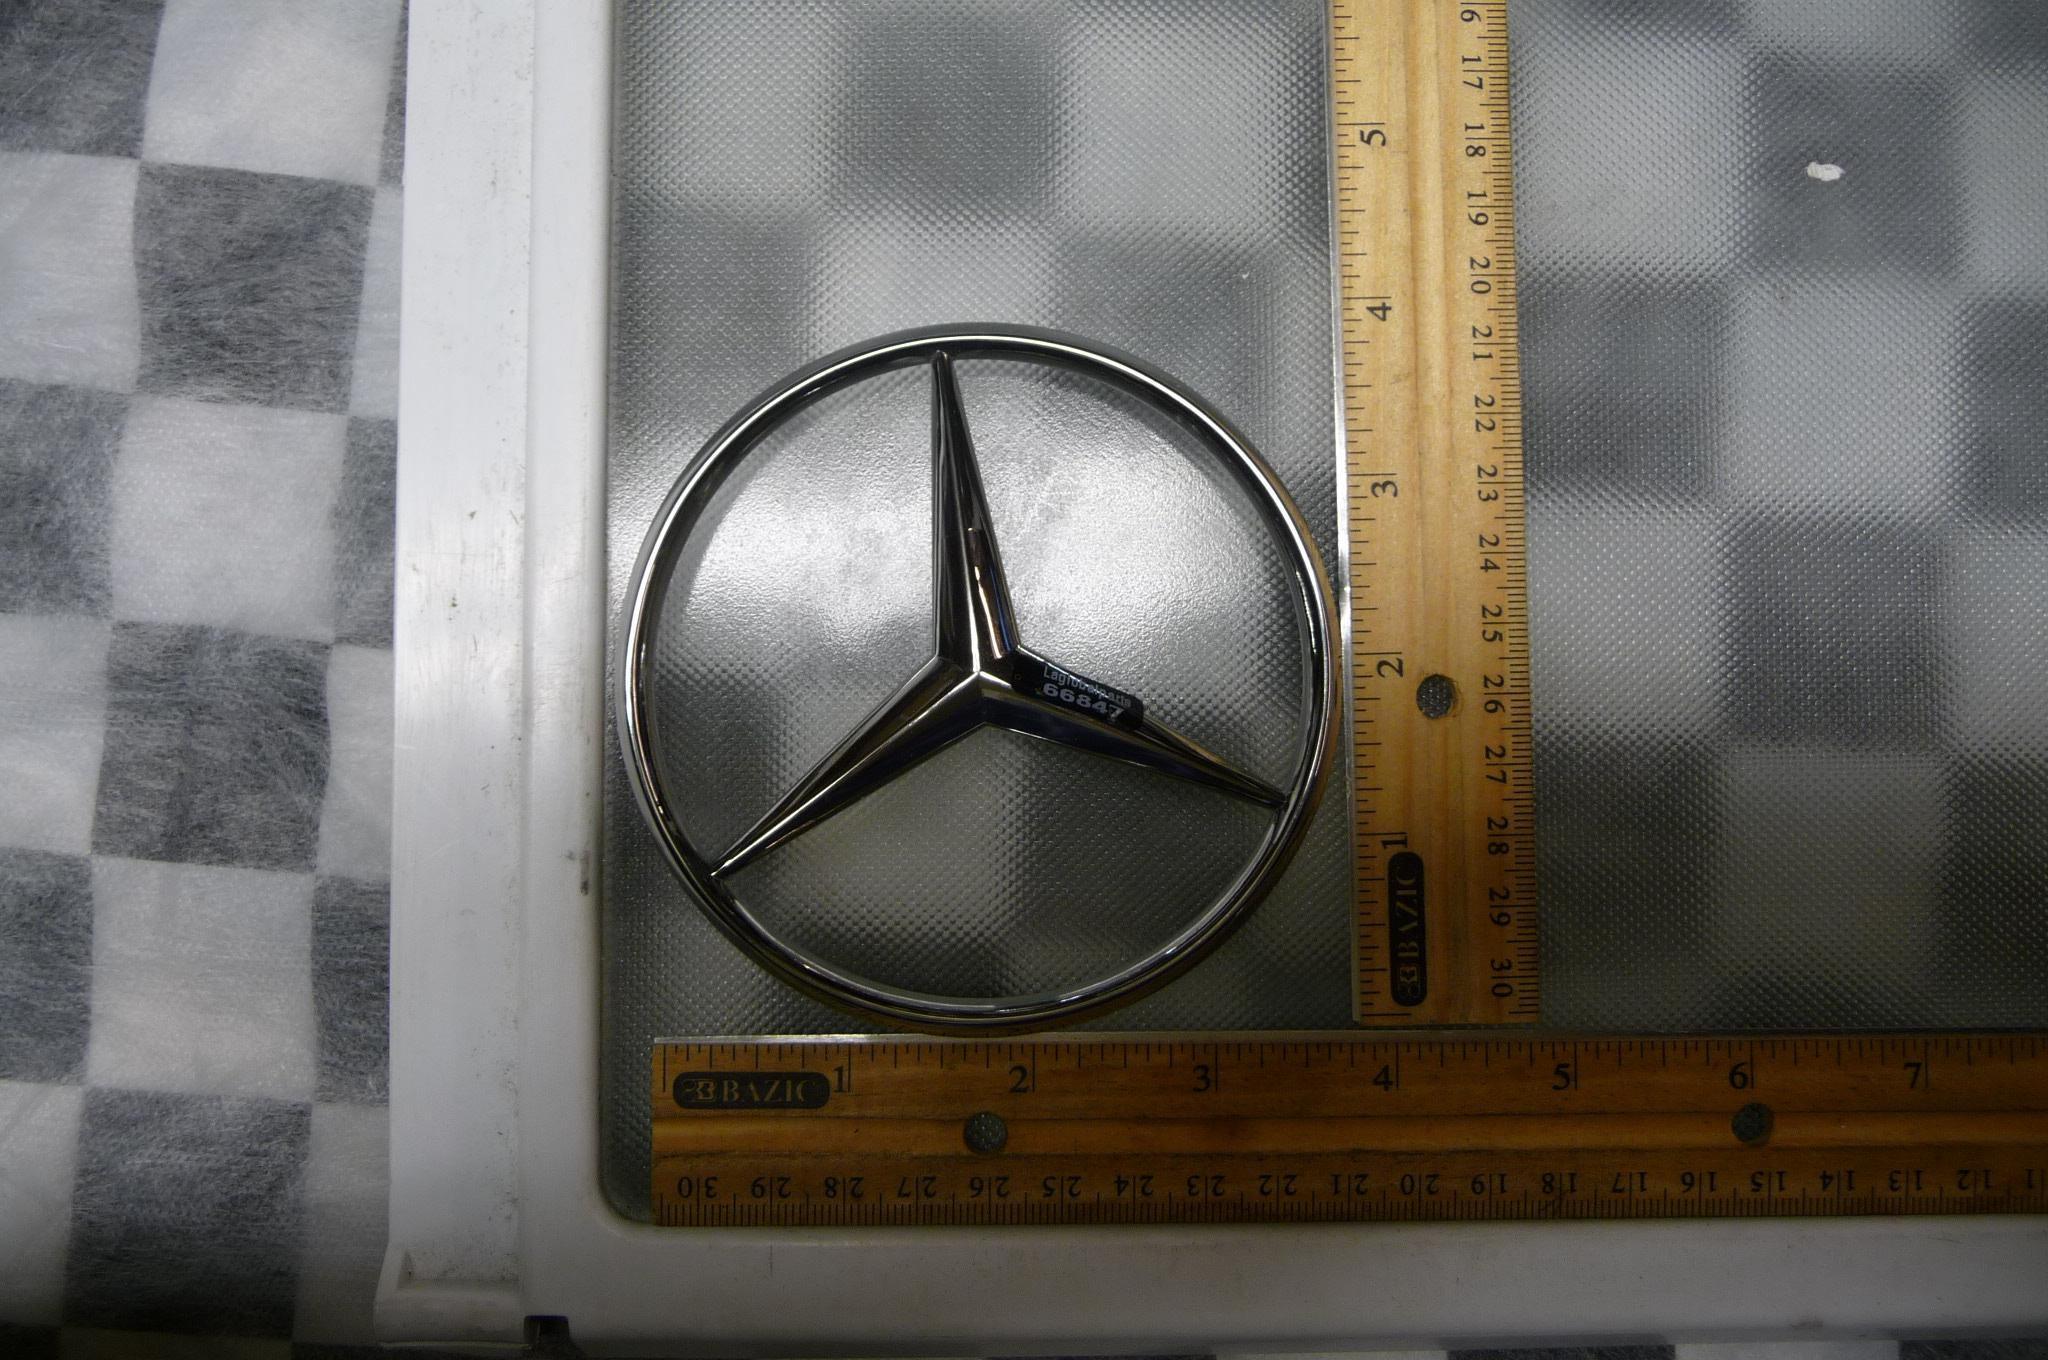 Mercedes Benz W201 E Class 190E Trunk Rear Lid Emblem Badge Nameplate 2017580058